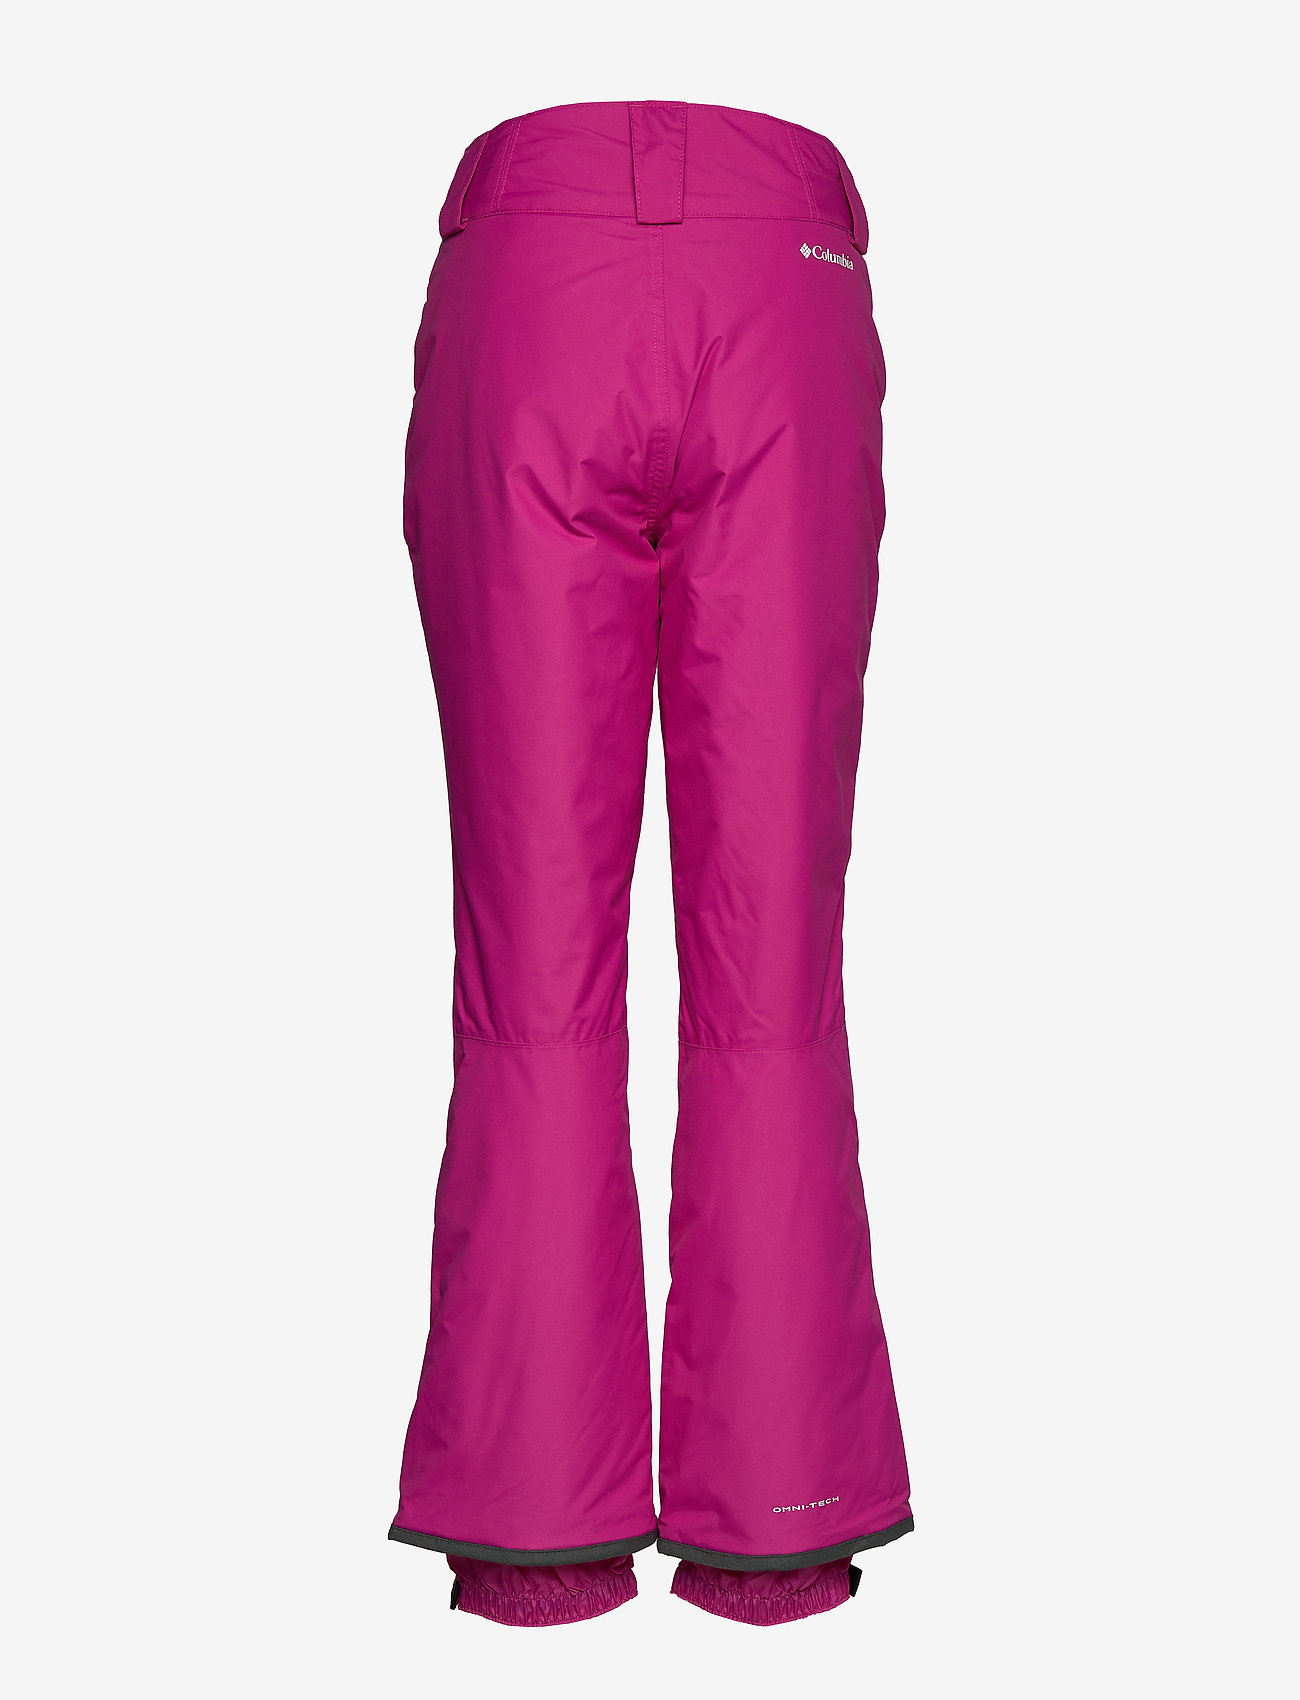 Columbia - On the Slope II Pant - spodnie narciarskie - fuchsia - 1